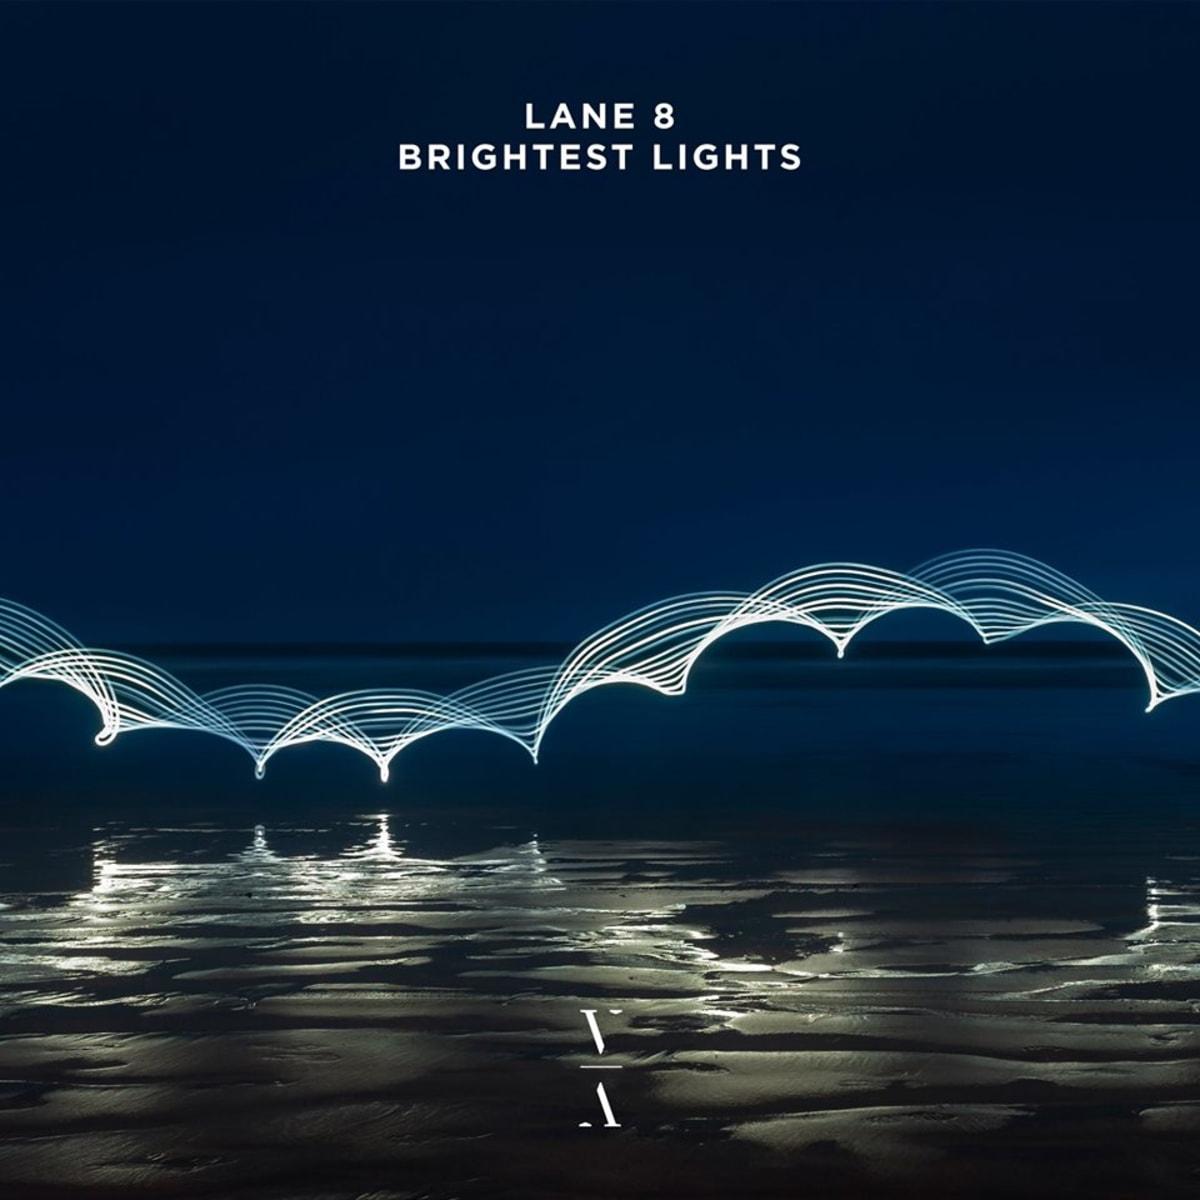 Lane 8 Brightest Lights Tour - Rescheduled for 2021 Calendar